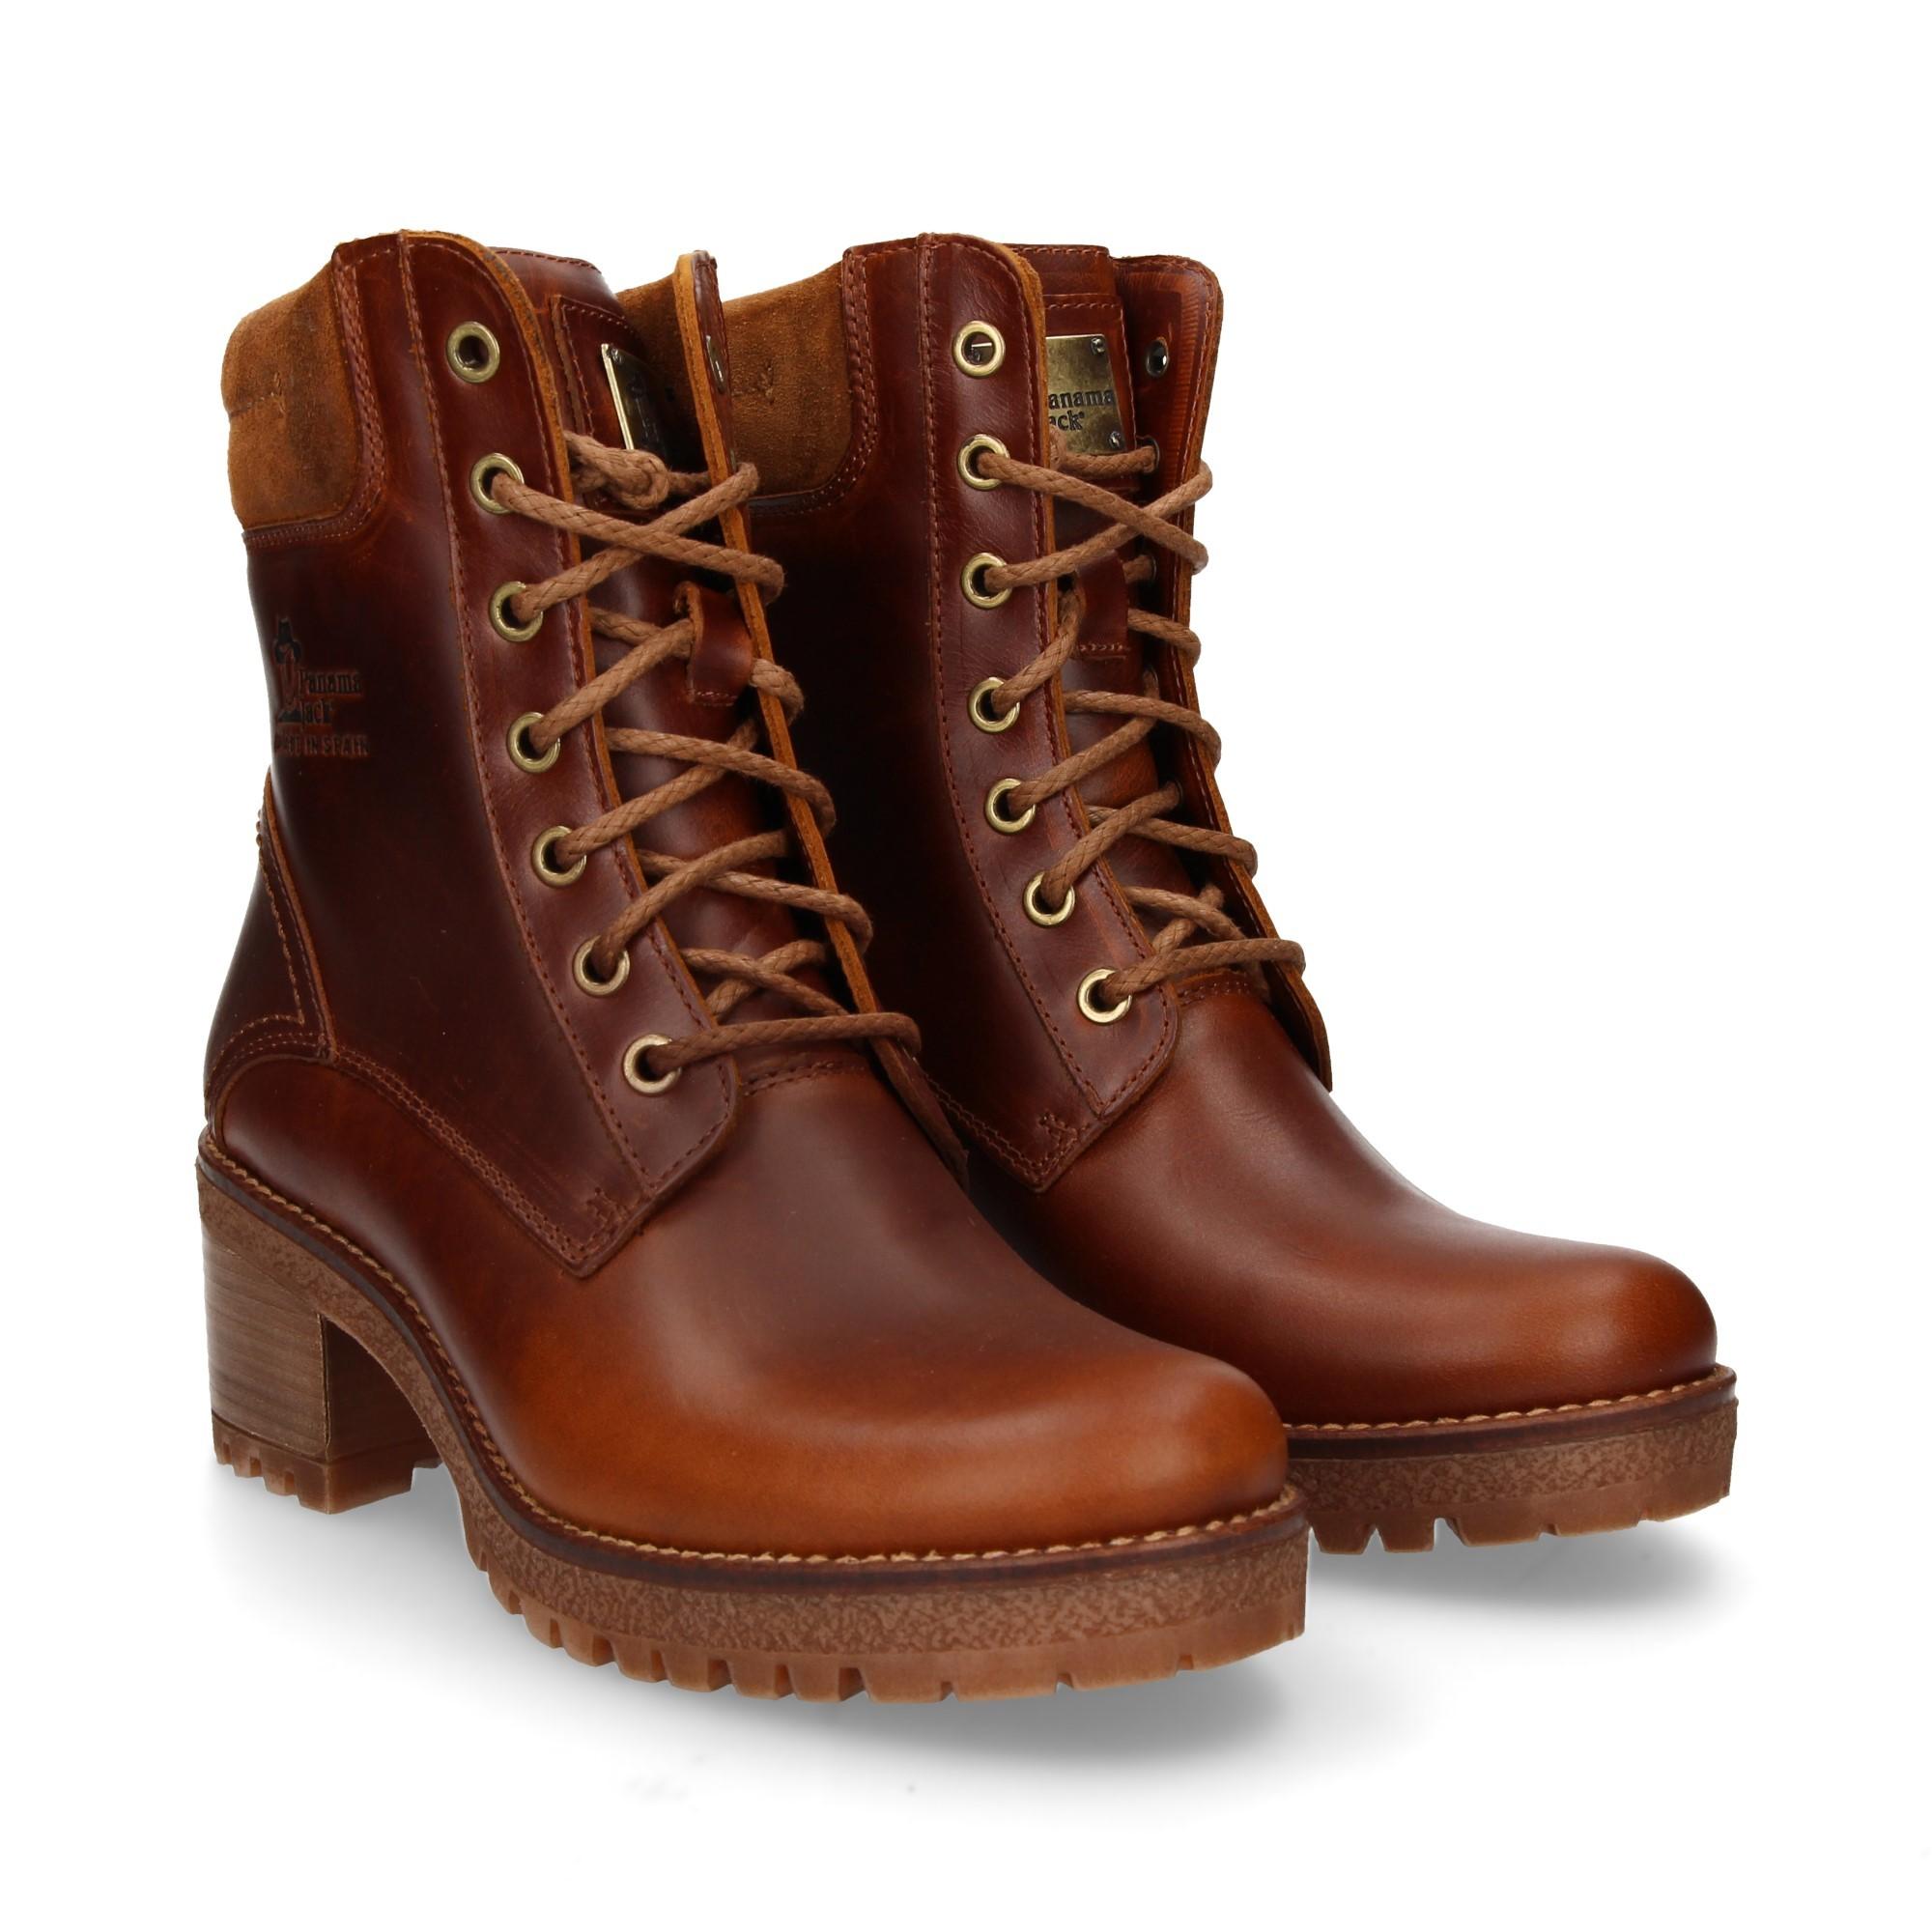 22219bfbc63a2 PANAMA JACK Women s Heeled ankle boots PHOEBE B14 NAPA CUERO